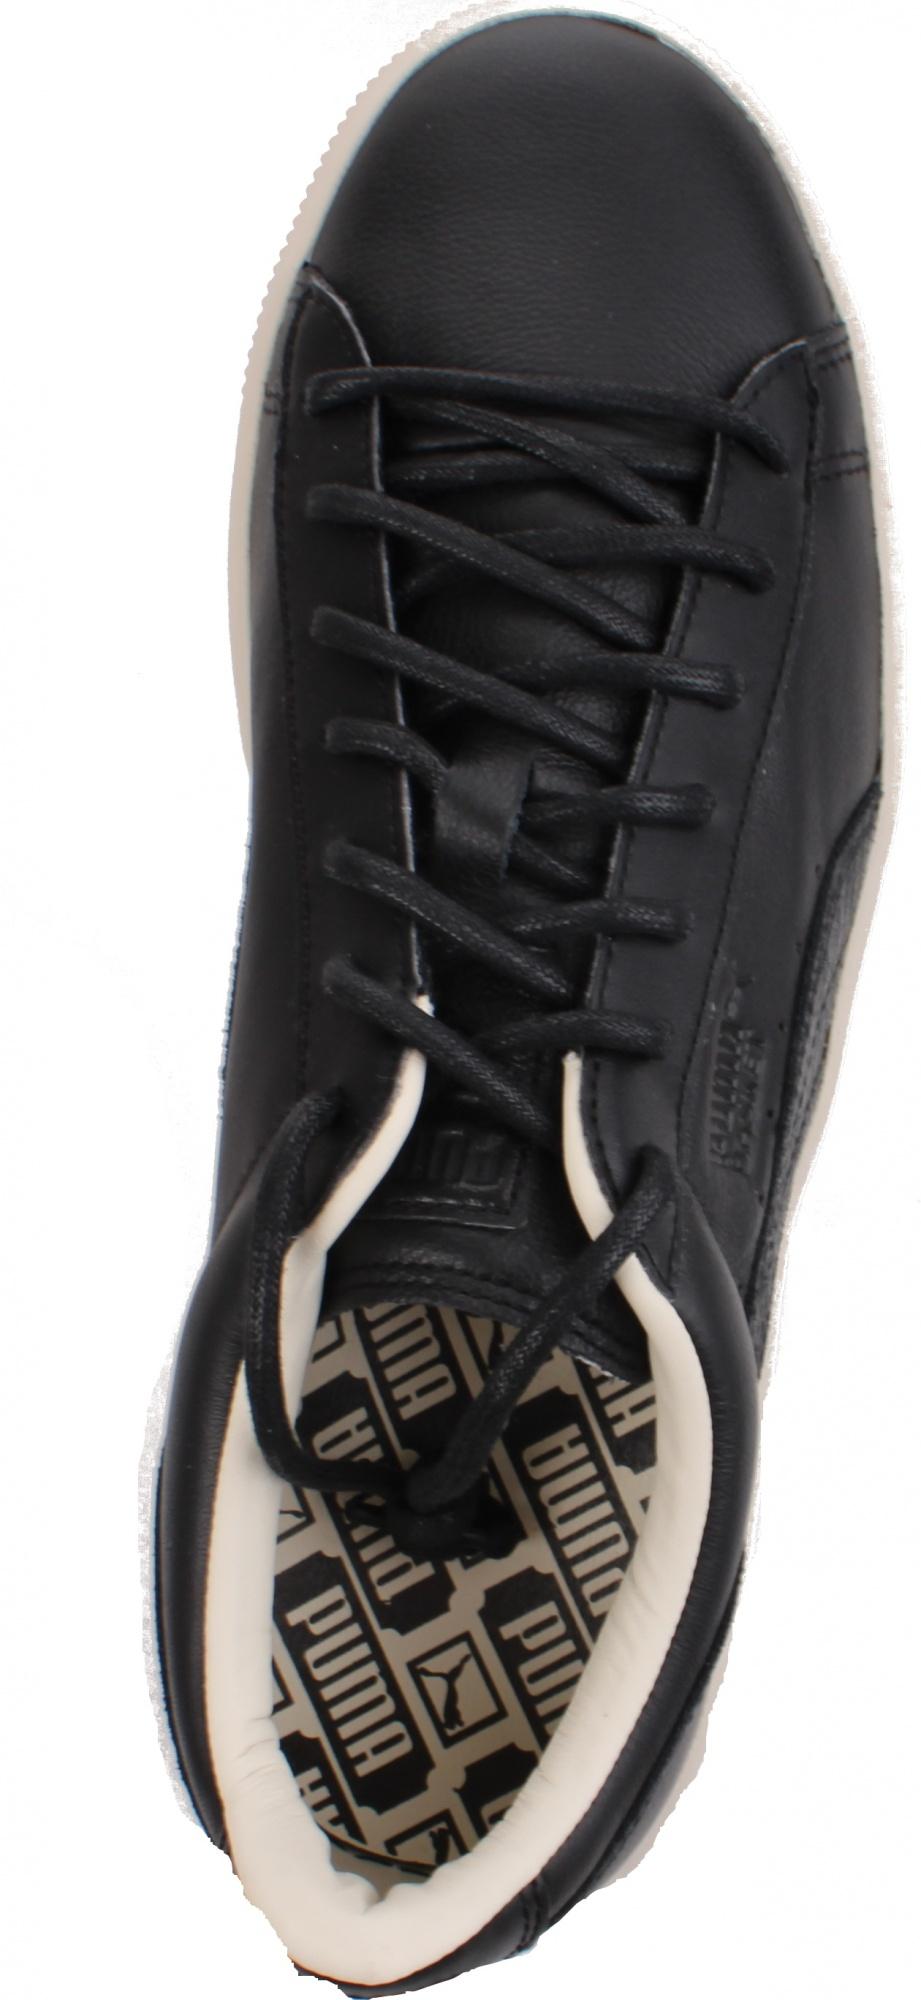 d0687d4d163 Puma sneakers Basket Classic zwart heren - Giga-Bikes Tilburg